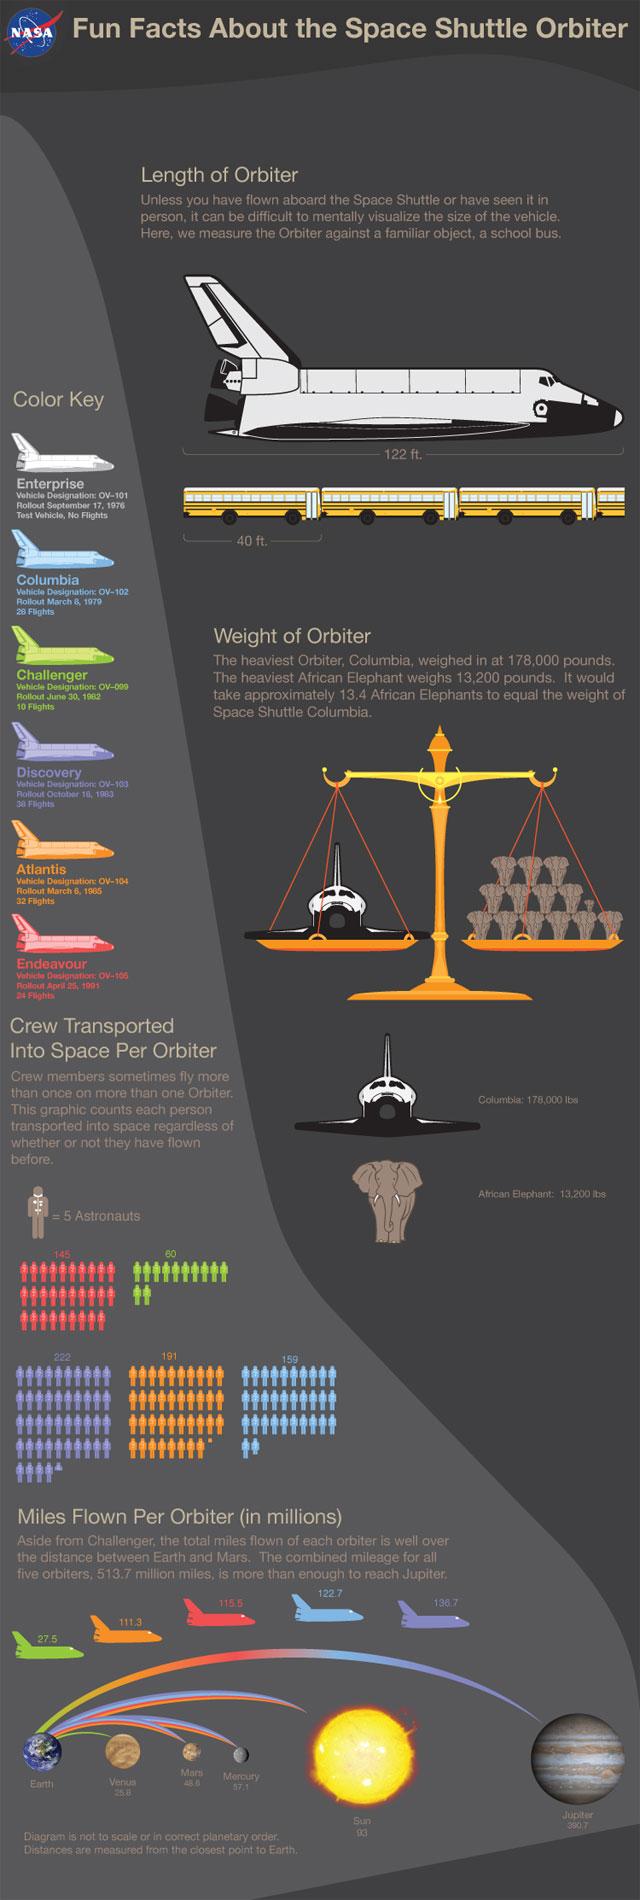 nasa_infographic